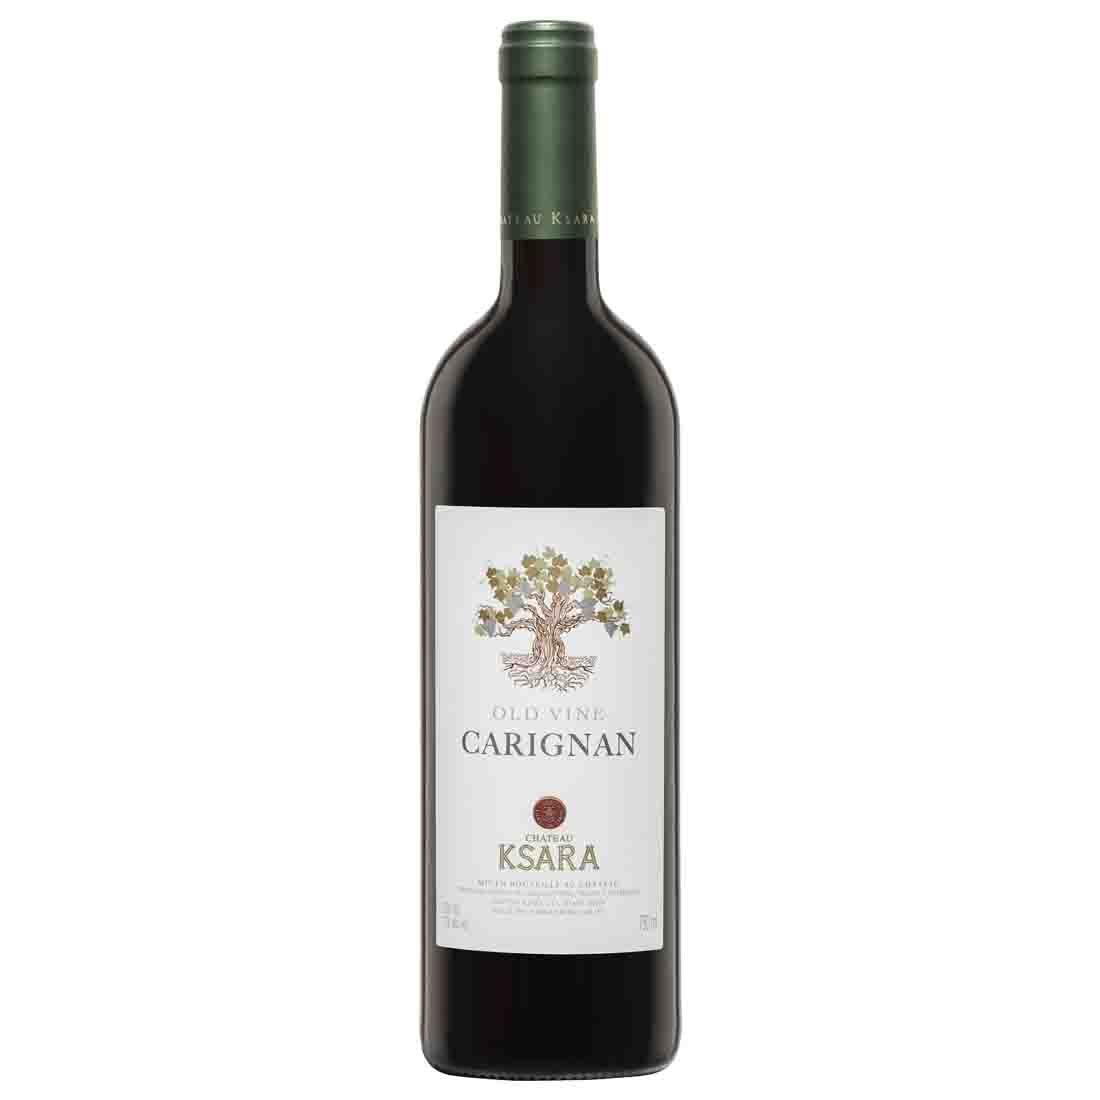 chateau ksara best fruity light lebanese red wine carignan old vines single variety bekaa valley